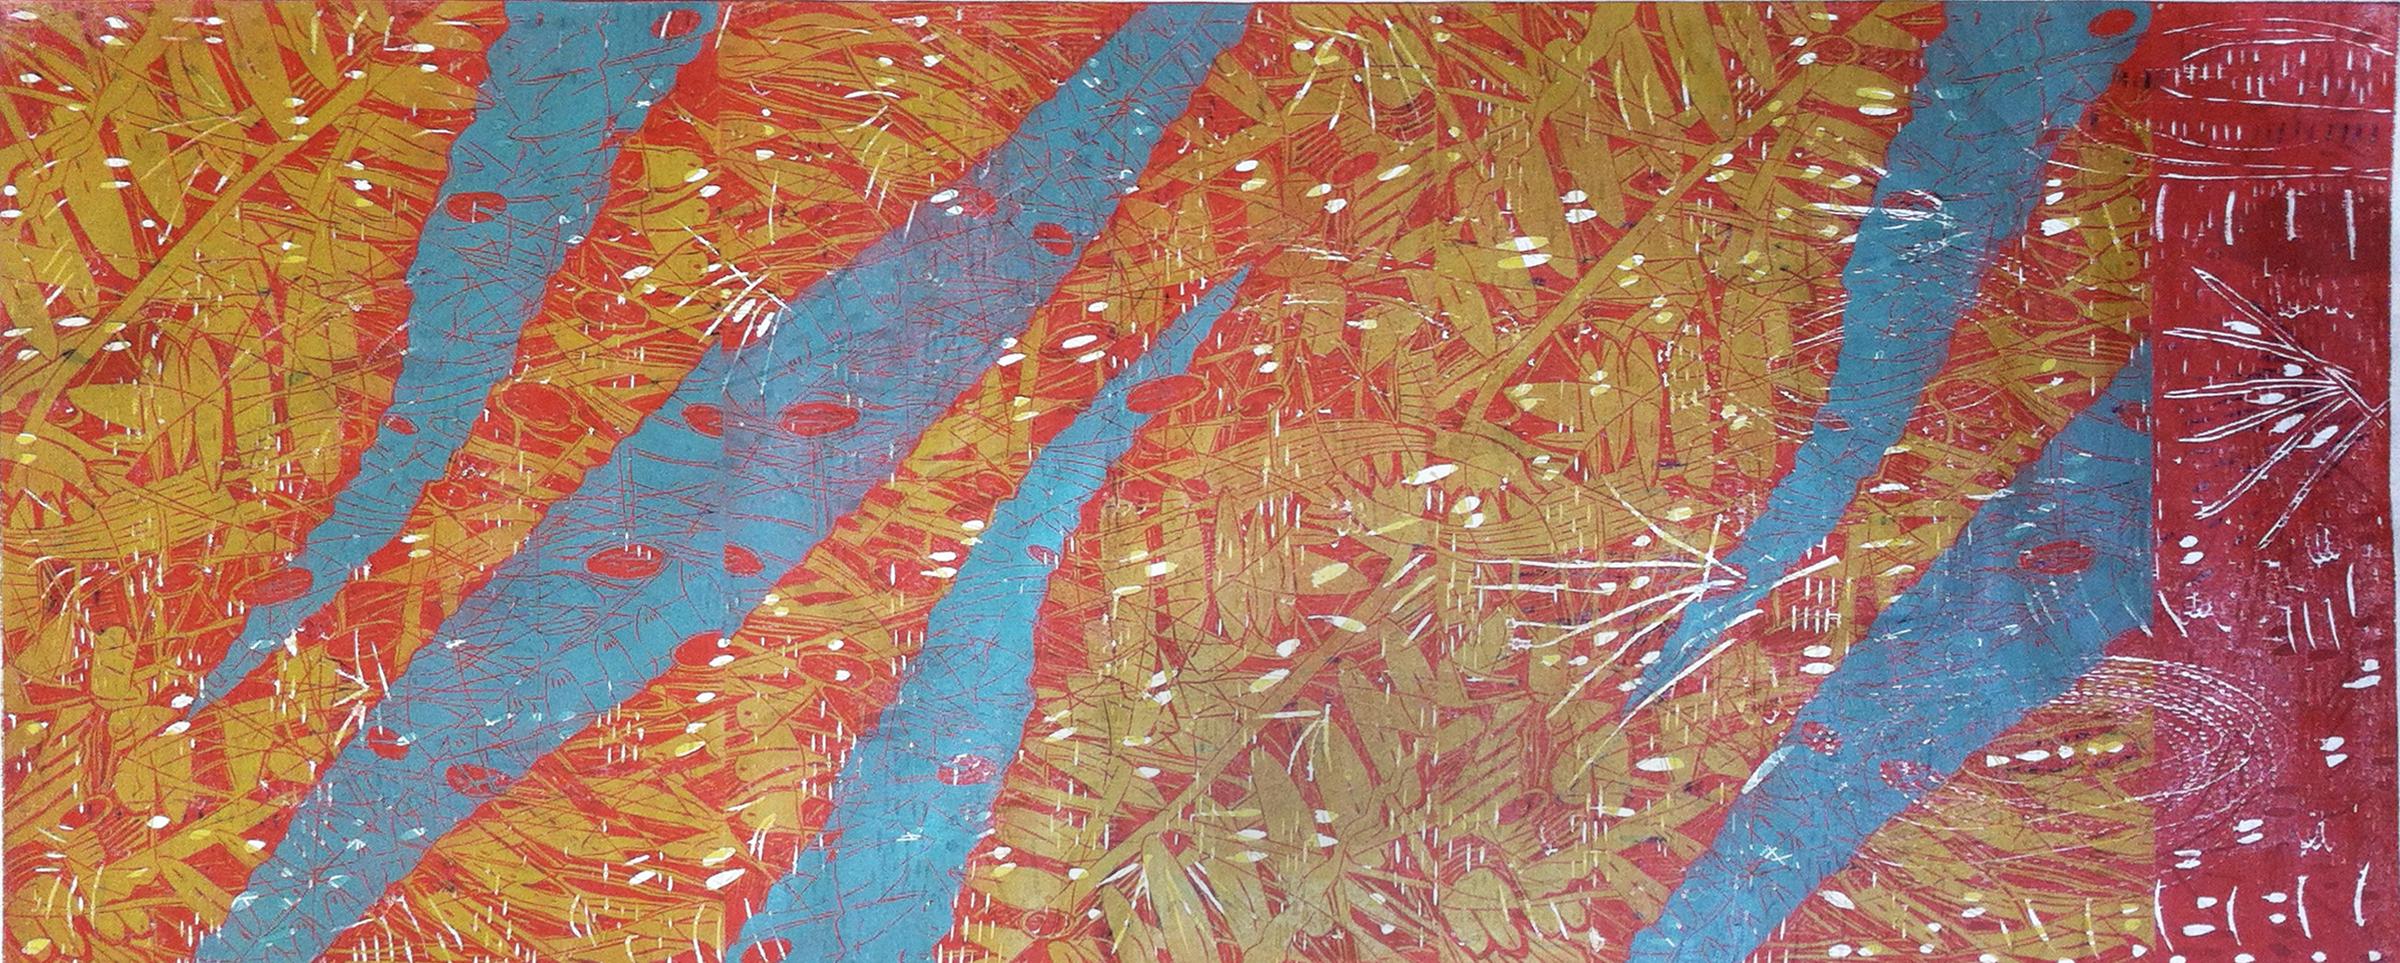 """Blue Ferns,"" 2013, 1/1  woodcut print on Japanese paper  28"" x 65 1/2"""